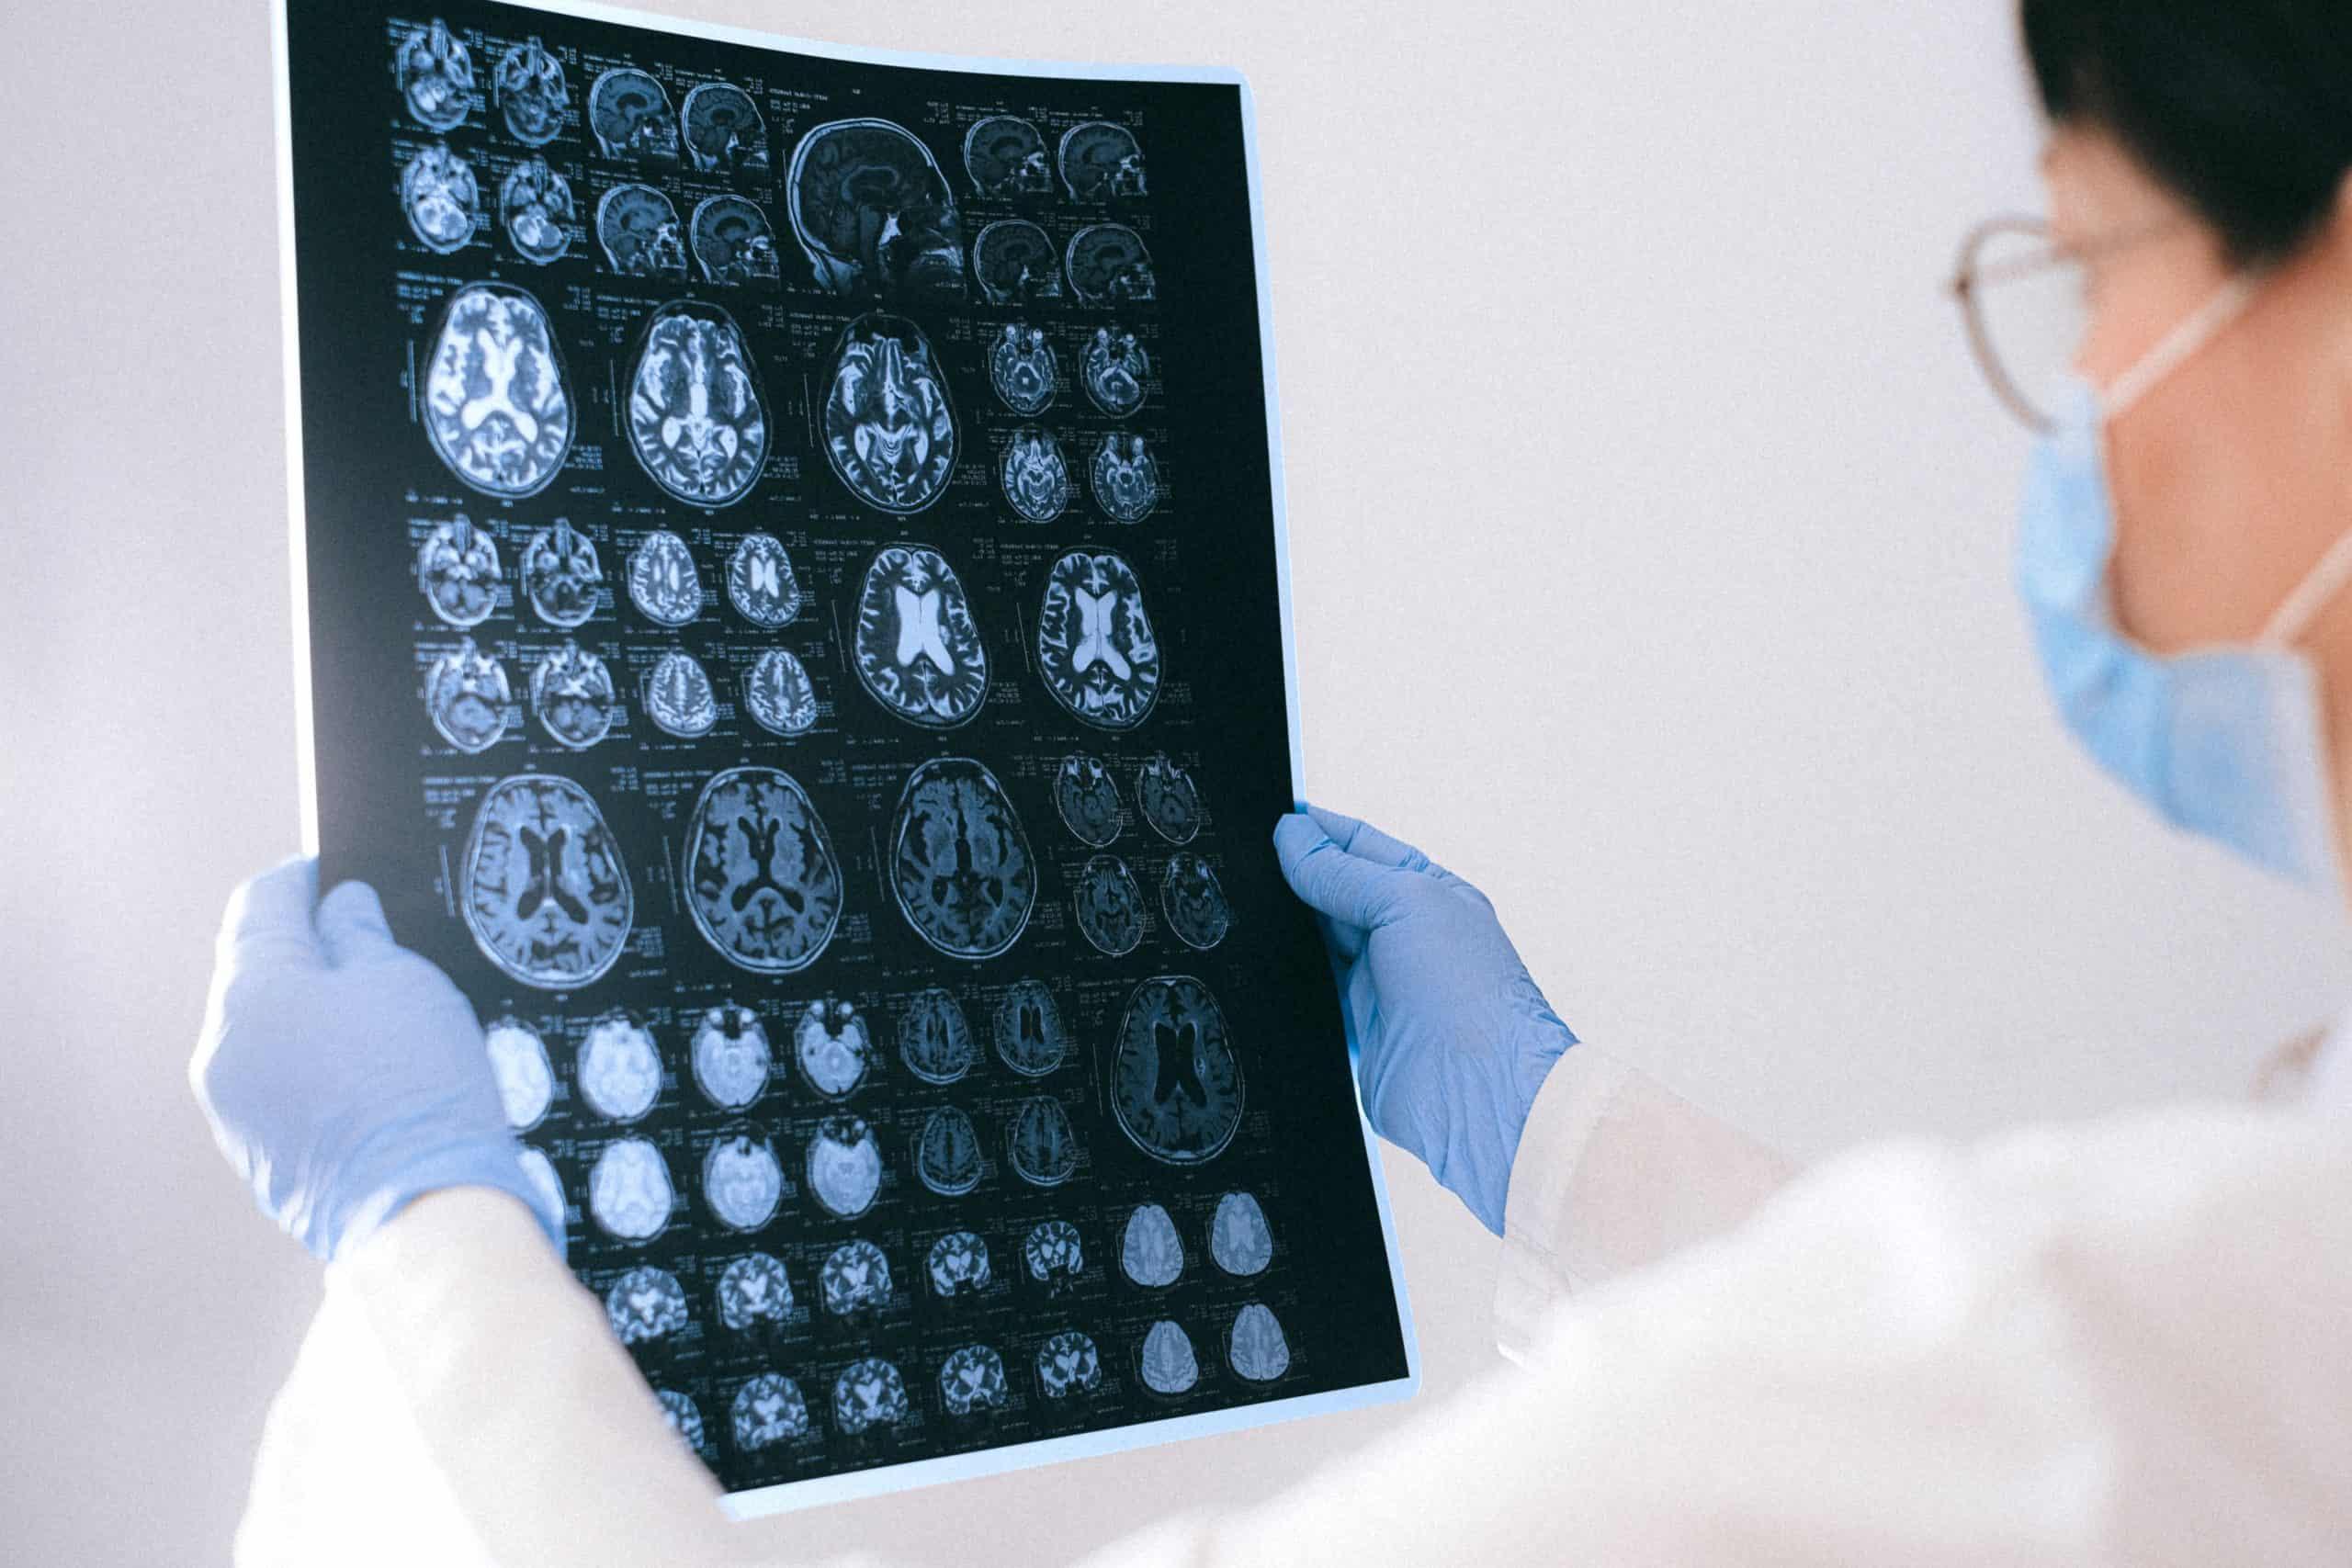 Best Neuropsychology course tutorial class certification training online